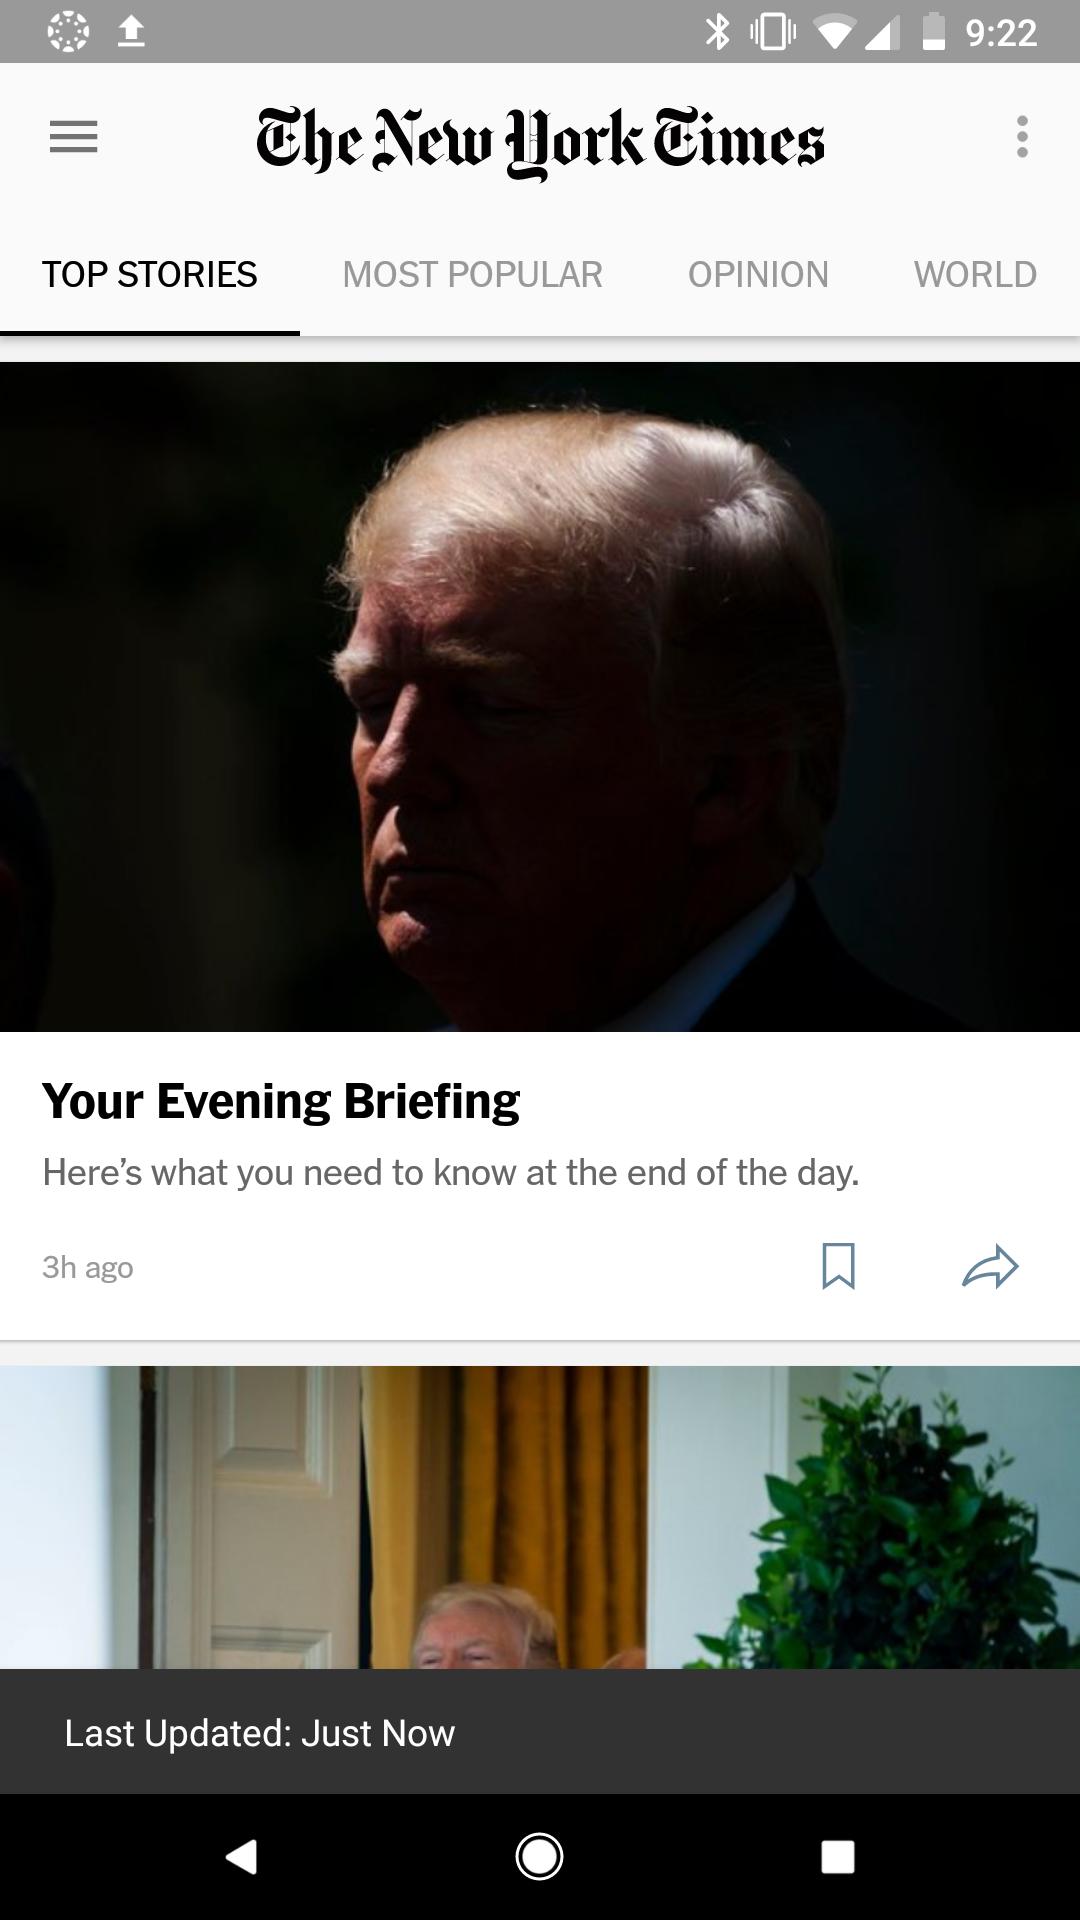 Same homepage as subscriber